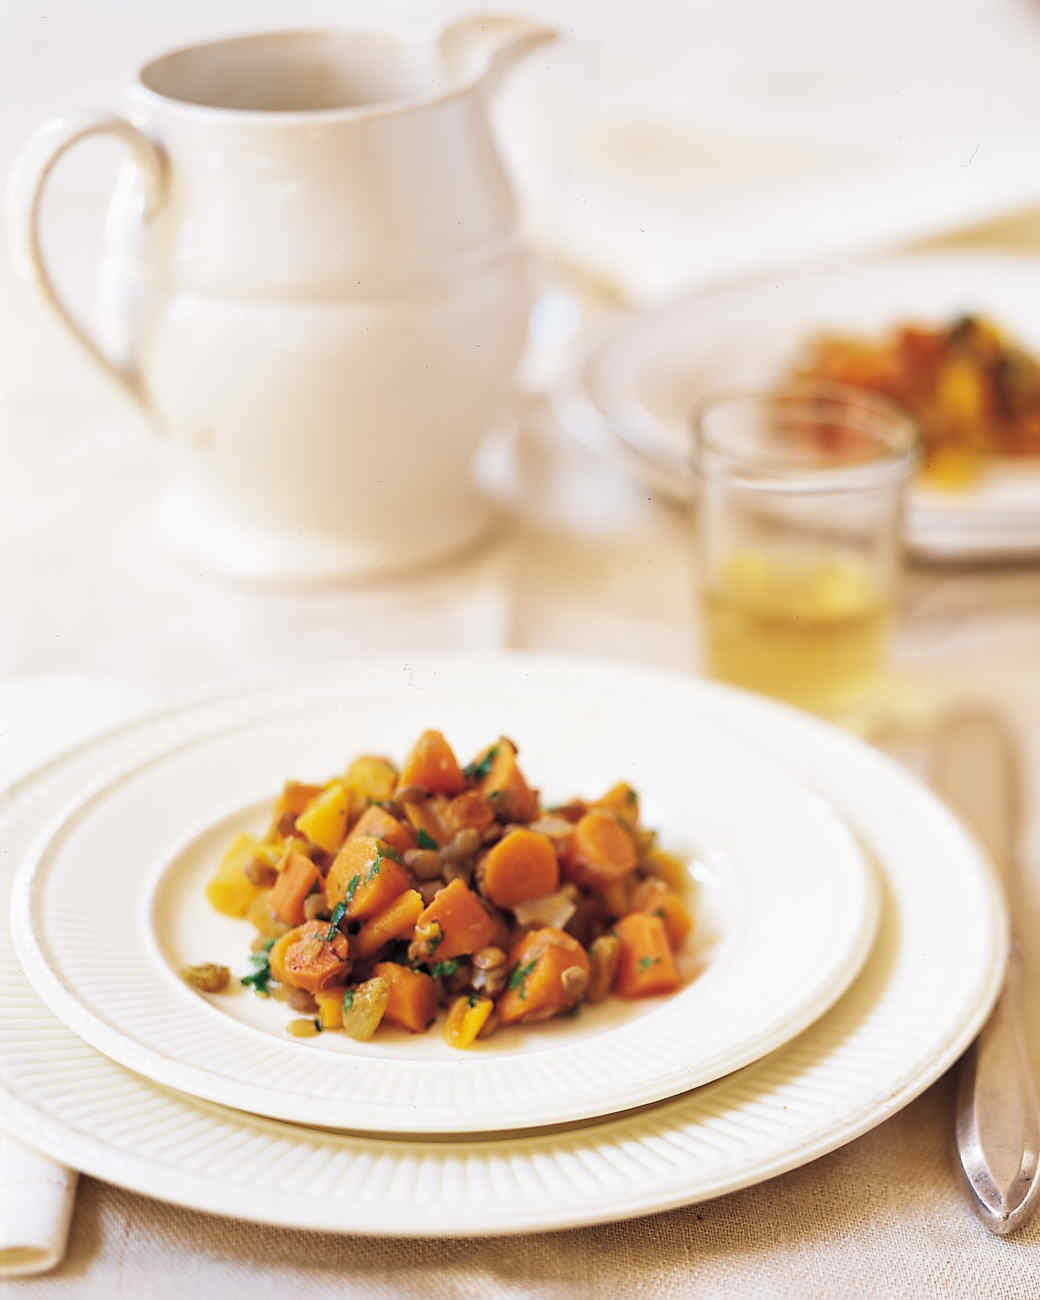 Warm Carrot and Lentil Salad